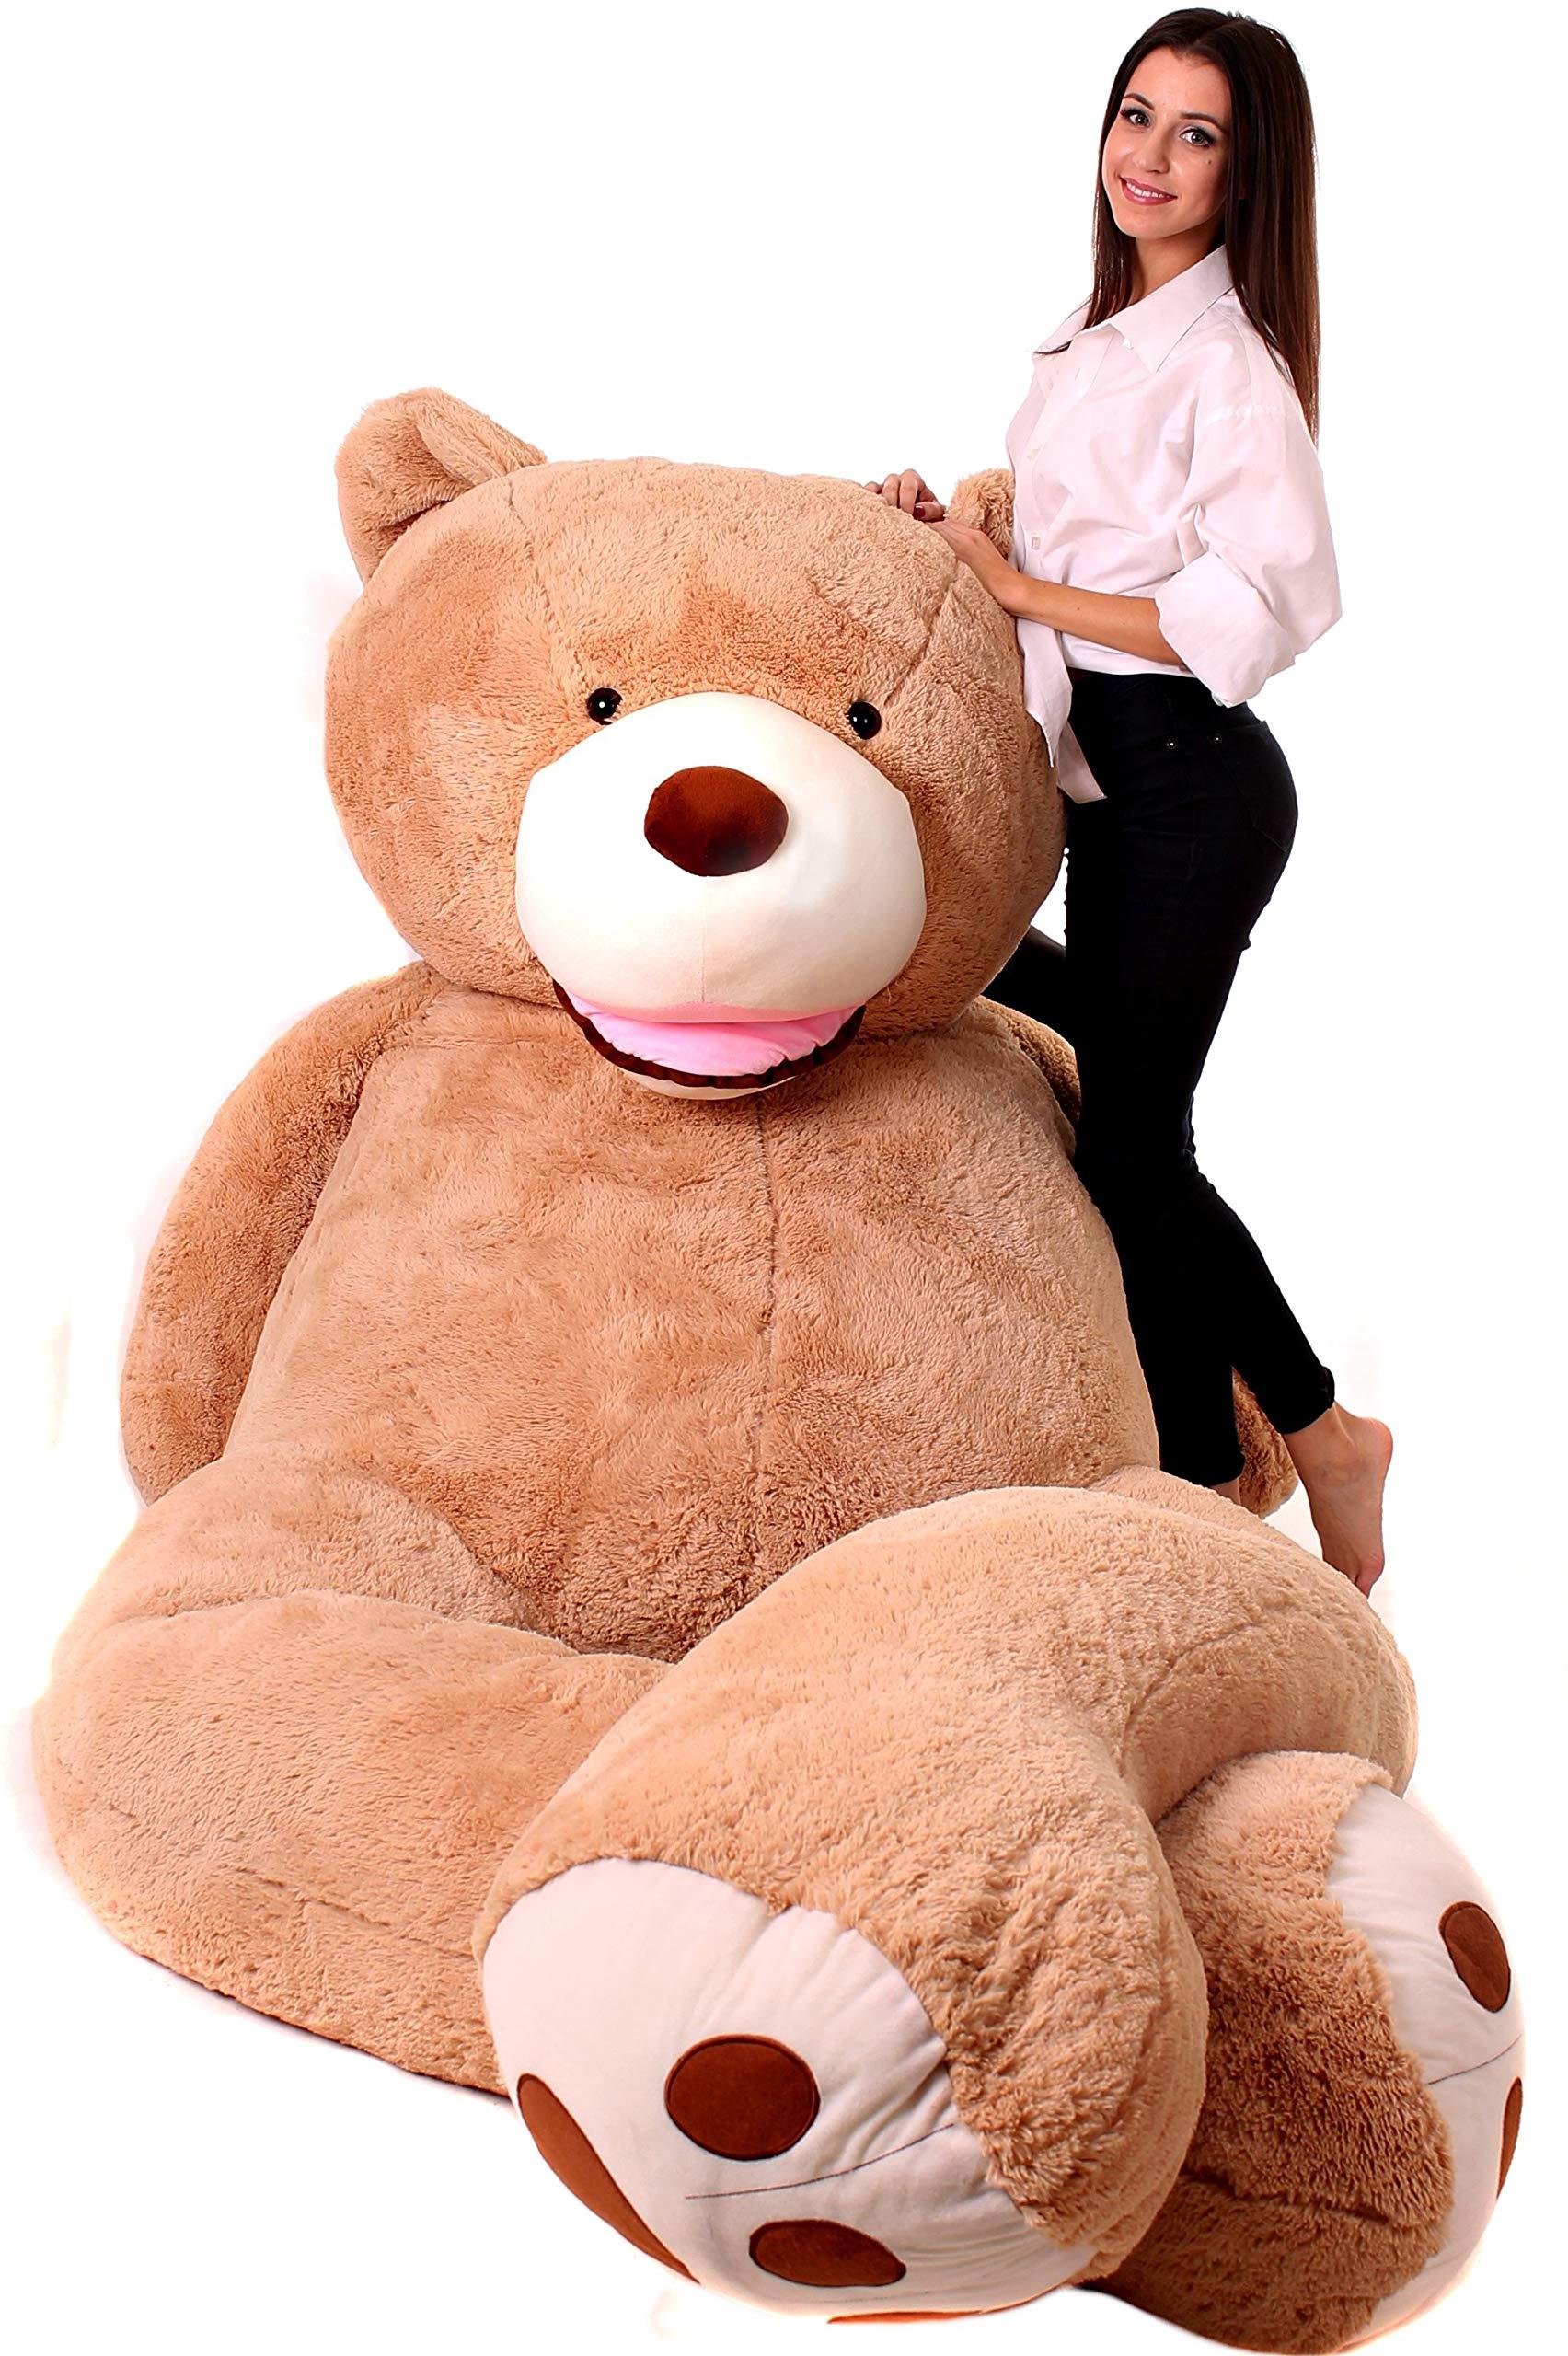 Hay Hay Chicken Stuffed Animal, Makosas Giant Teddy Bear 340cm Big Cud Buy Online In El Salvador At Desertcart